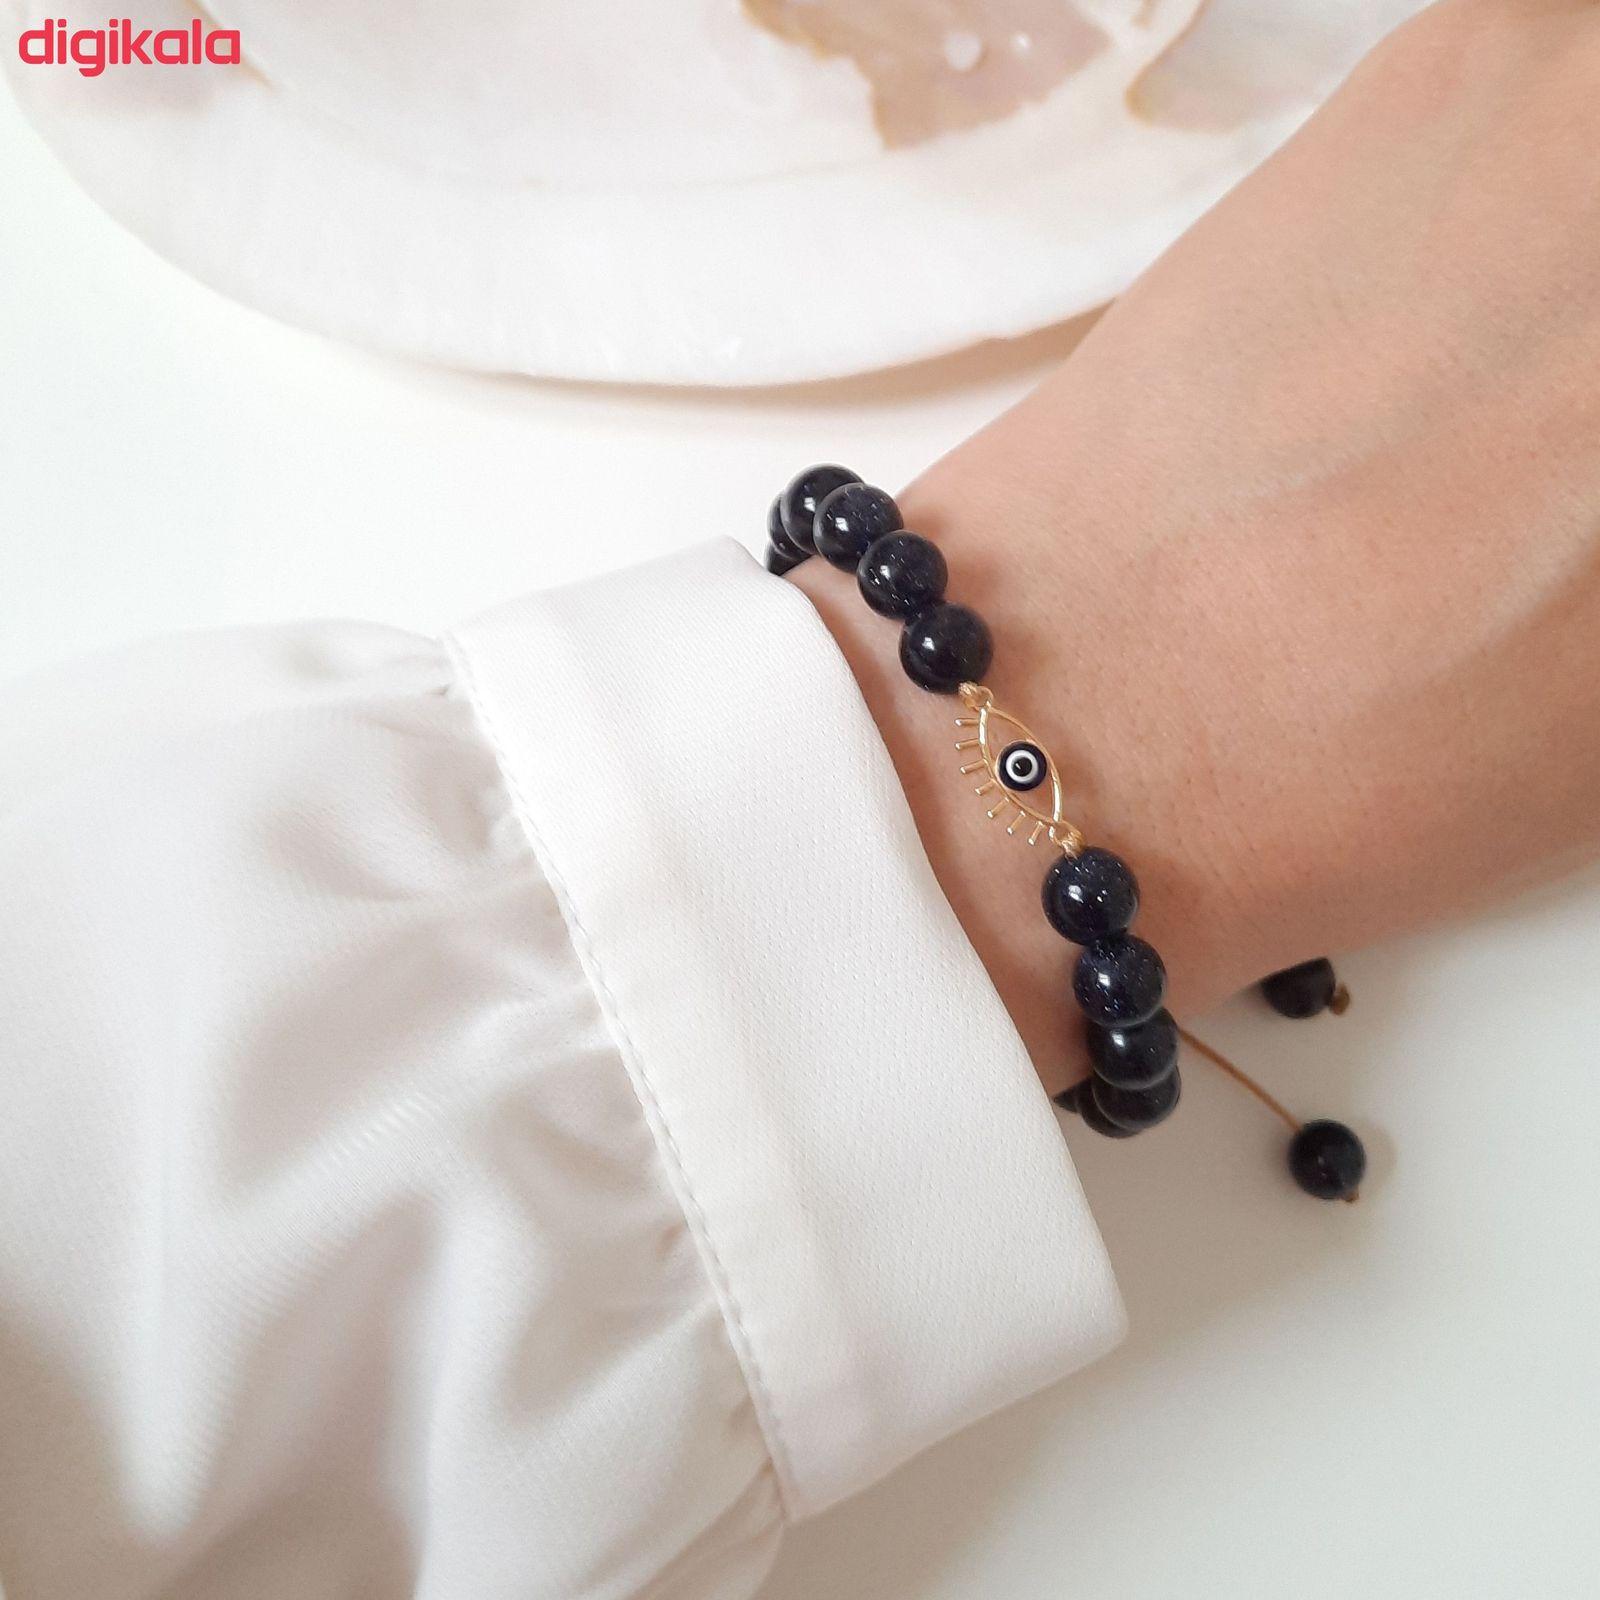 دستبند طلا 18 عیار زنانه الماسین آذر طرح چشم نظر کد CH03 -  - 6